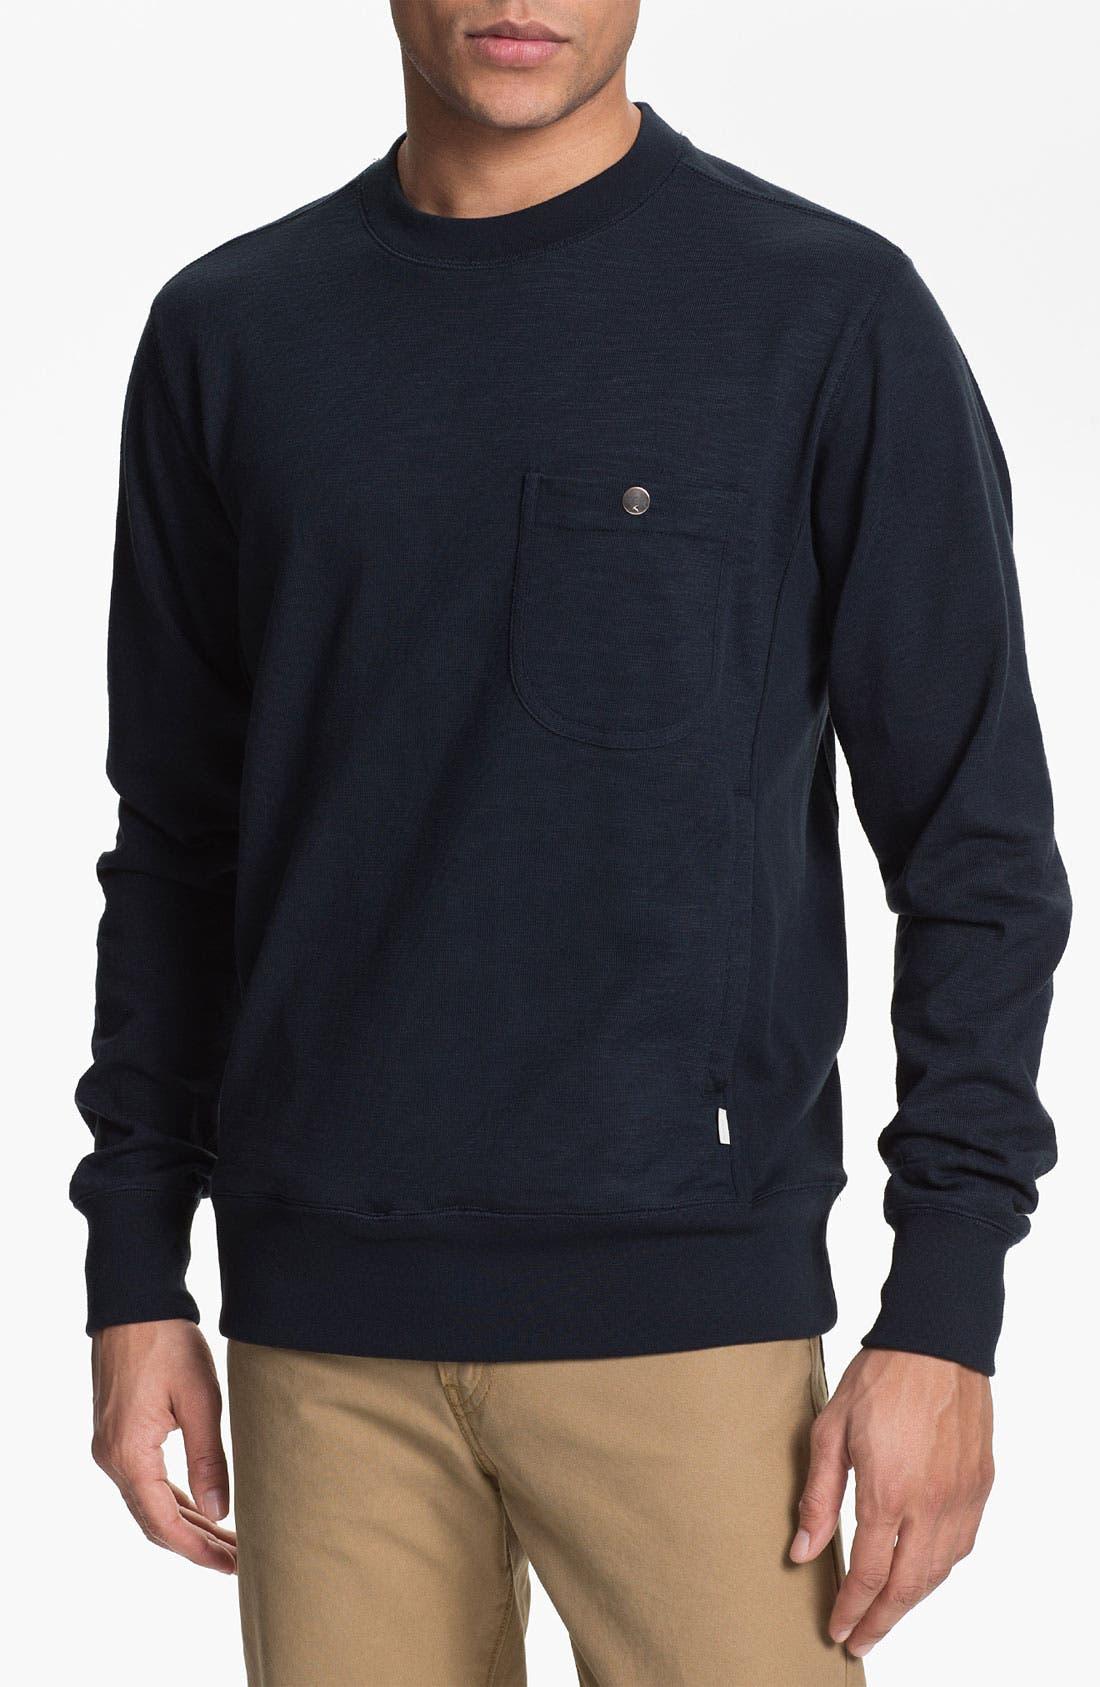 Main Image - Burton 'Grafton' Crewneck Sweatshirt